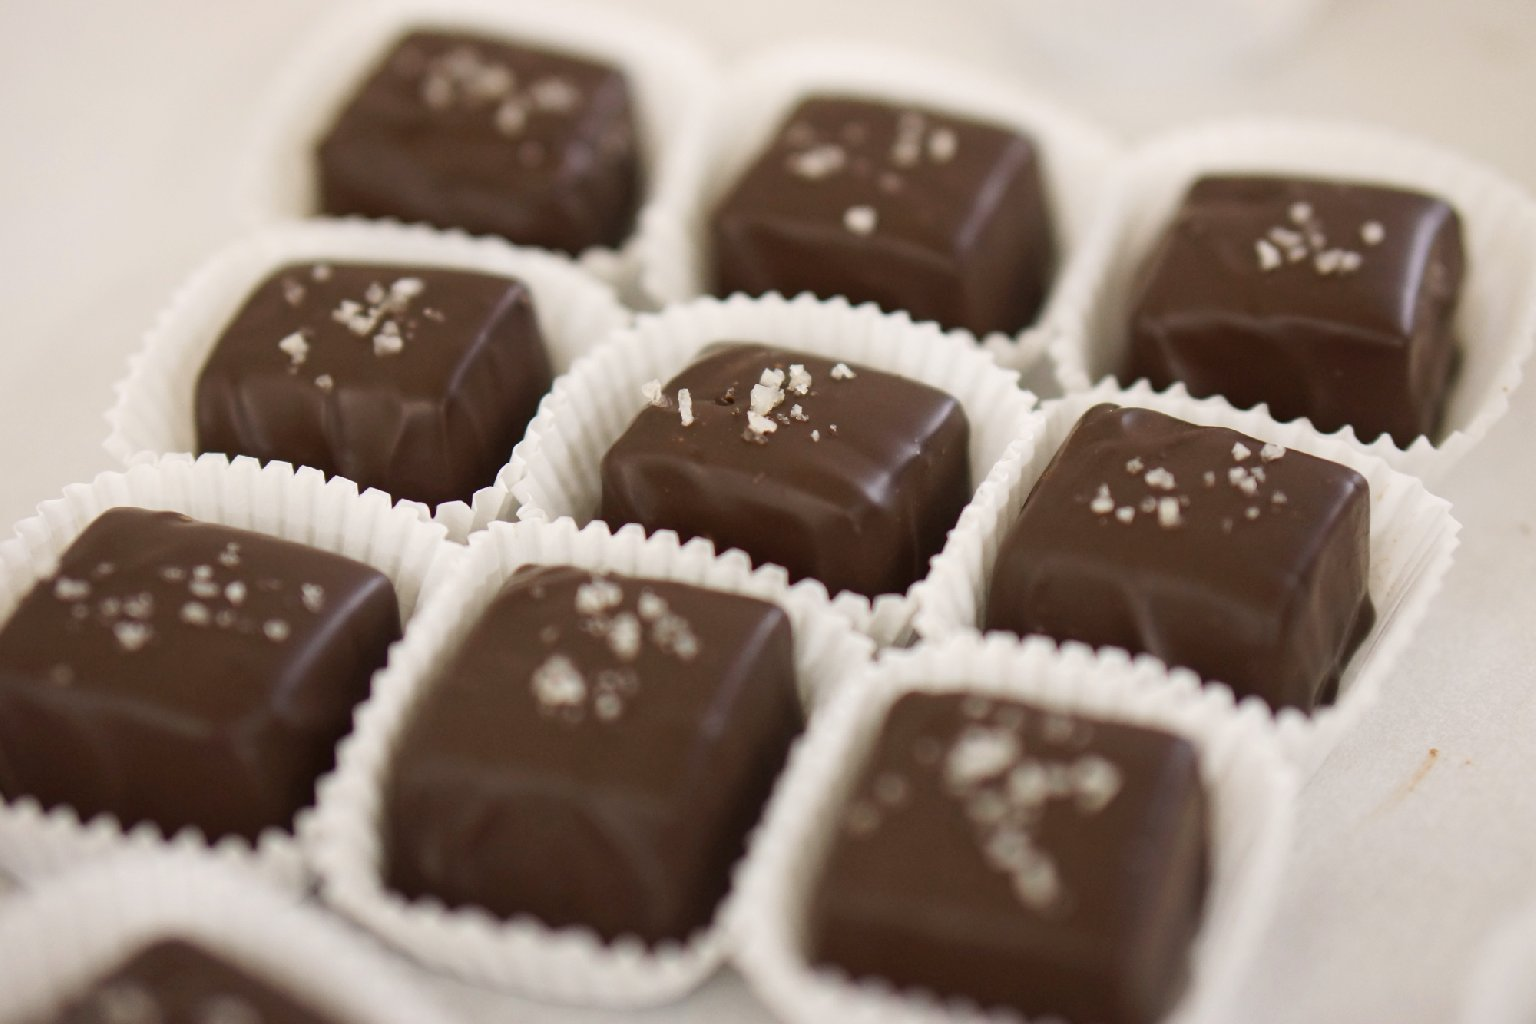 Poco Dolce caramels. Photo: Albert Moriguchi